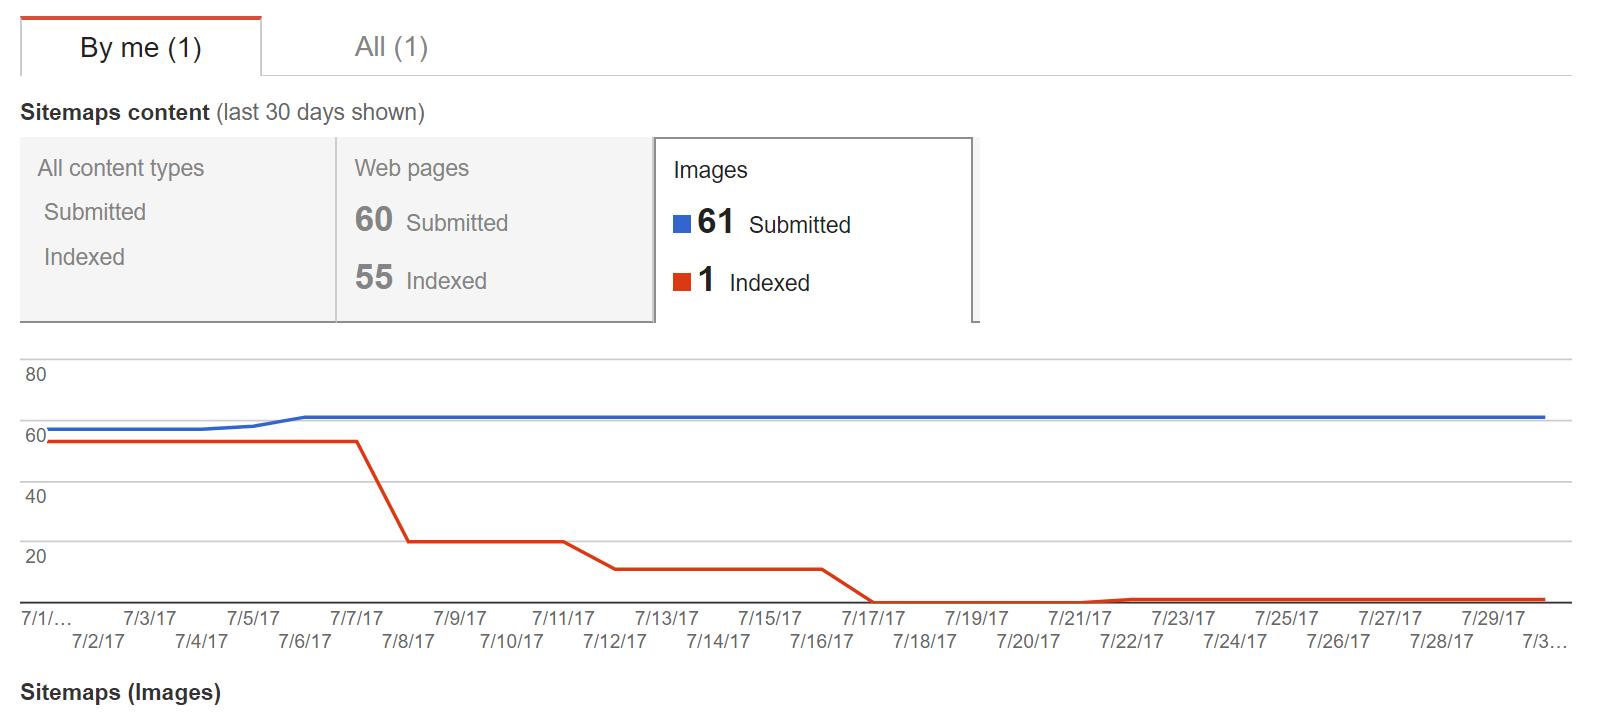 تصاویر گوگل ایندکس نمیشوند.